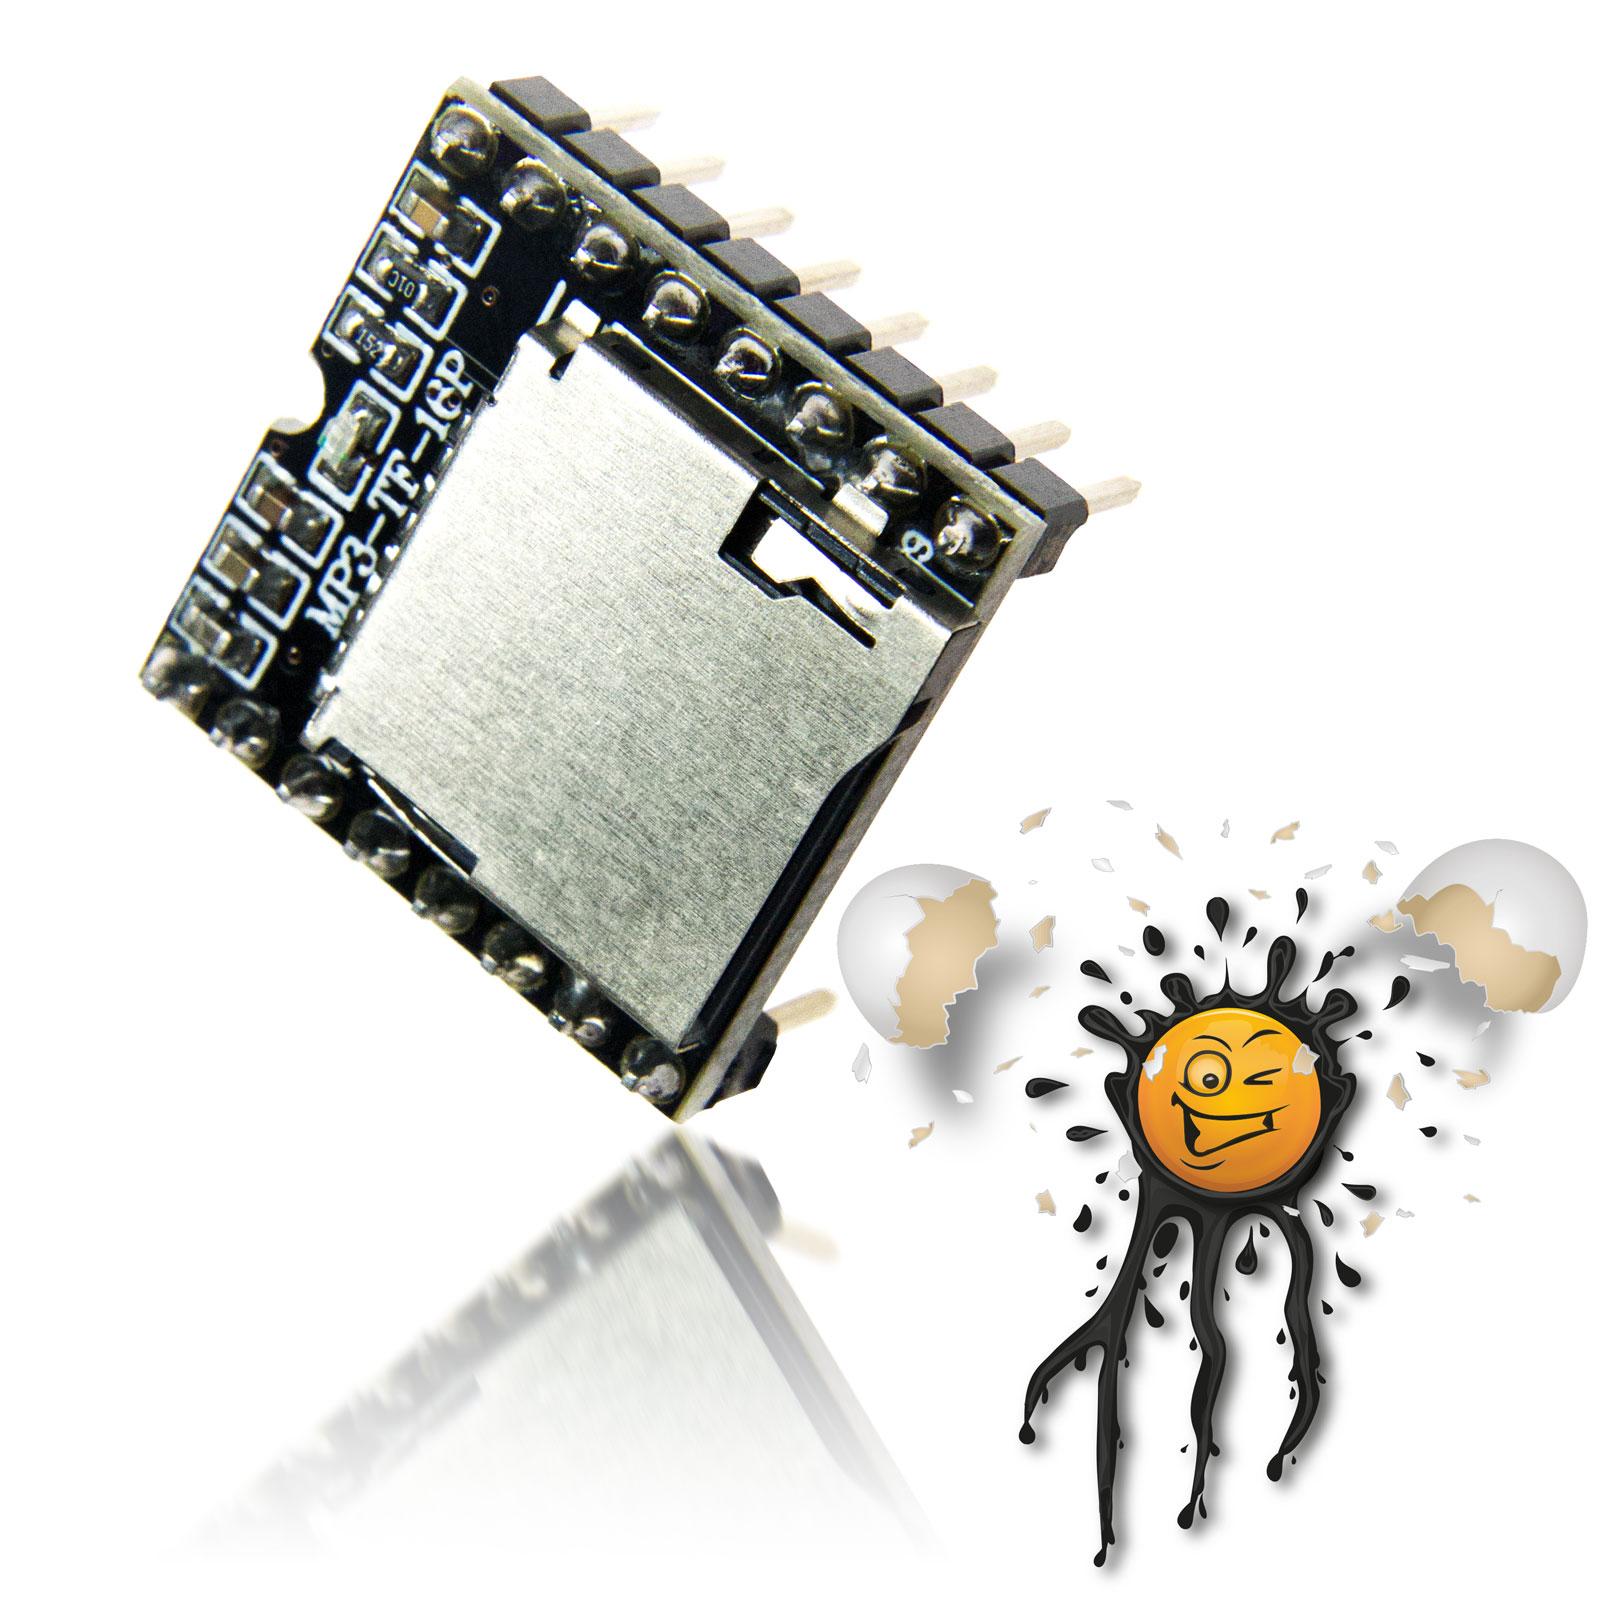 Arduino MP3 Module